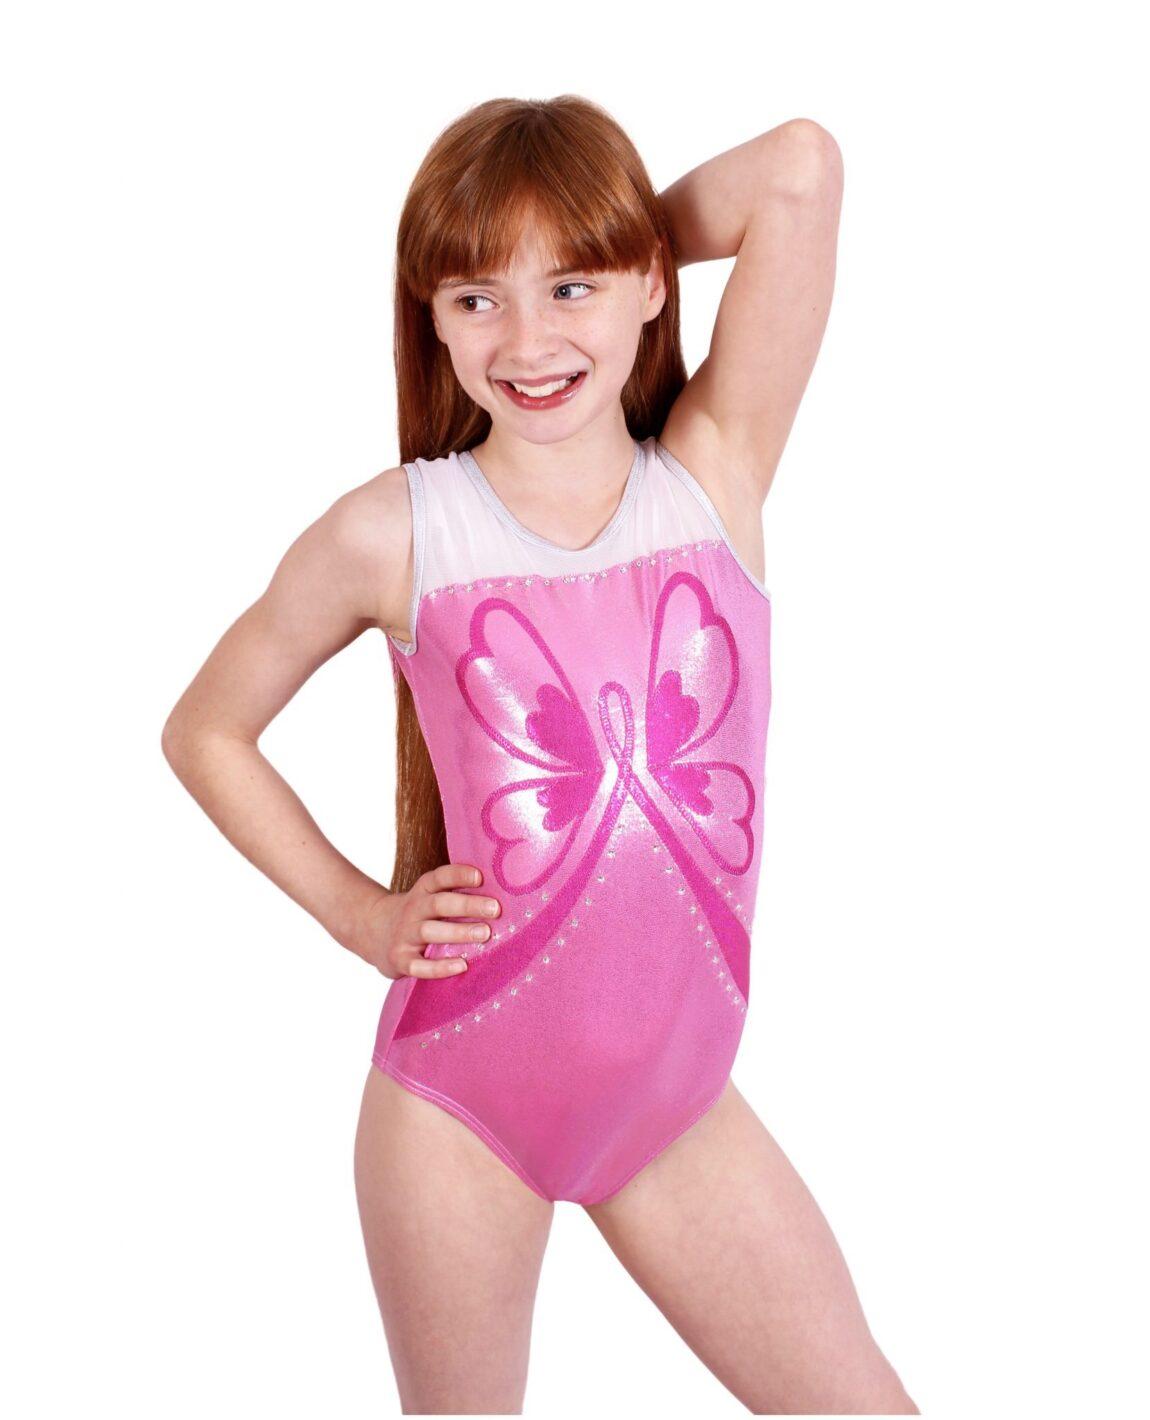 Pink Girls Gymnastics Leotards. Find your favorite pink gymnastics leotard here for your favorite gymnast. You won't have far to go. Snowflake Designs has the best leotards!